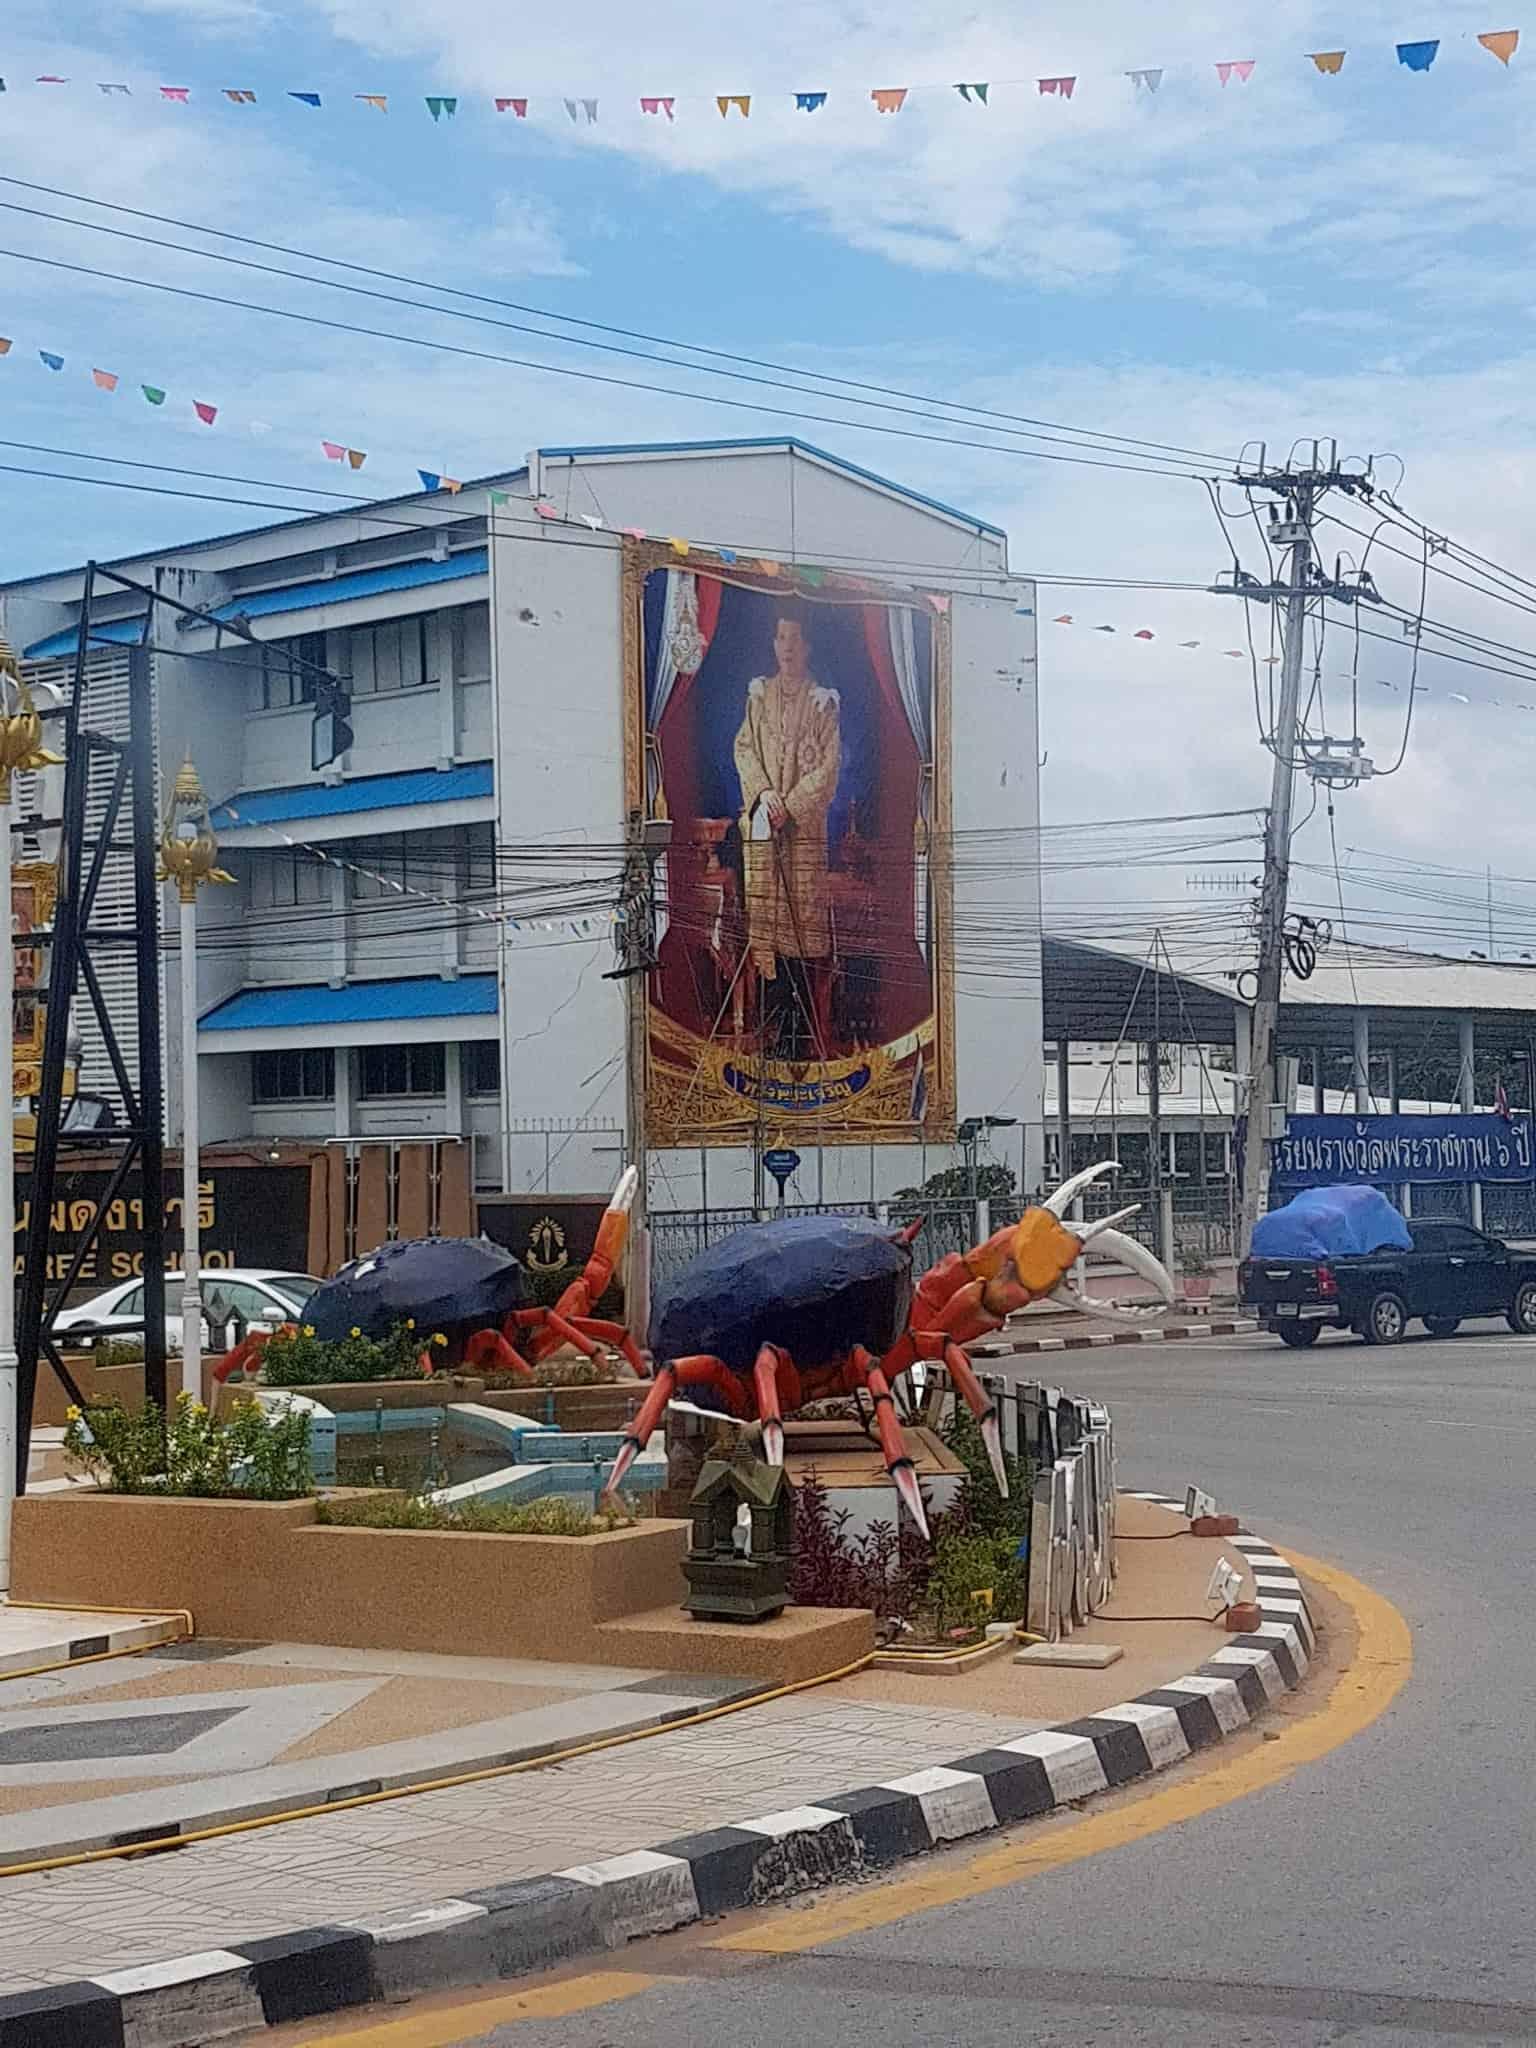 Thaïlande, d'interminables heures de bus qui nous font craquer notre slip 🩲 7